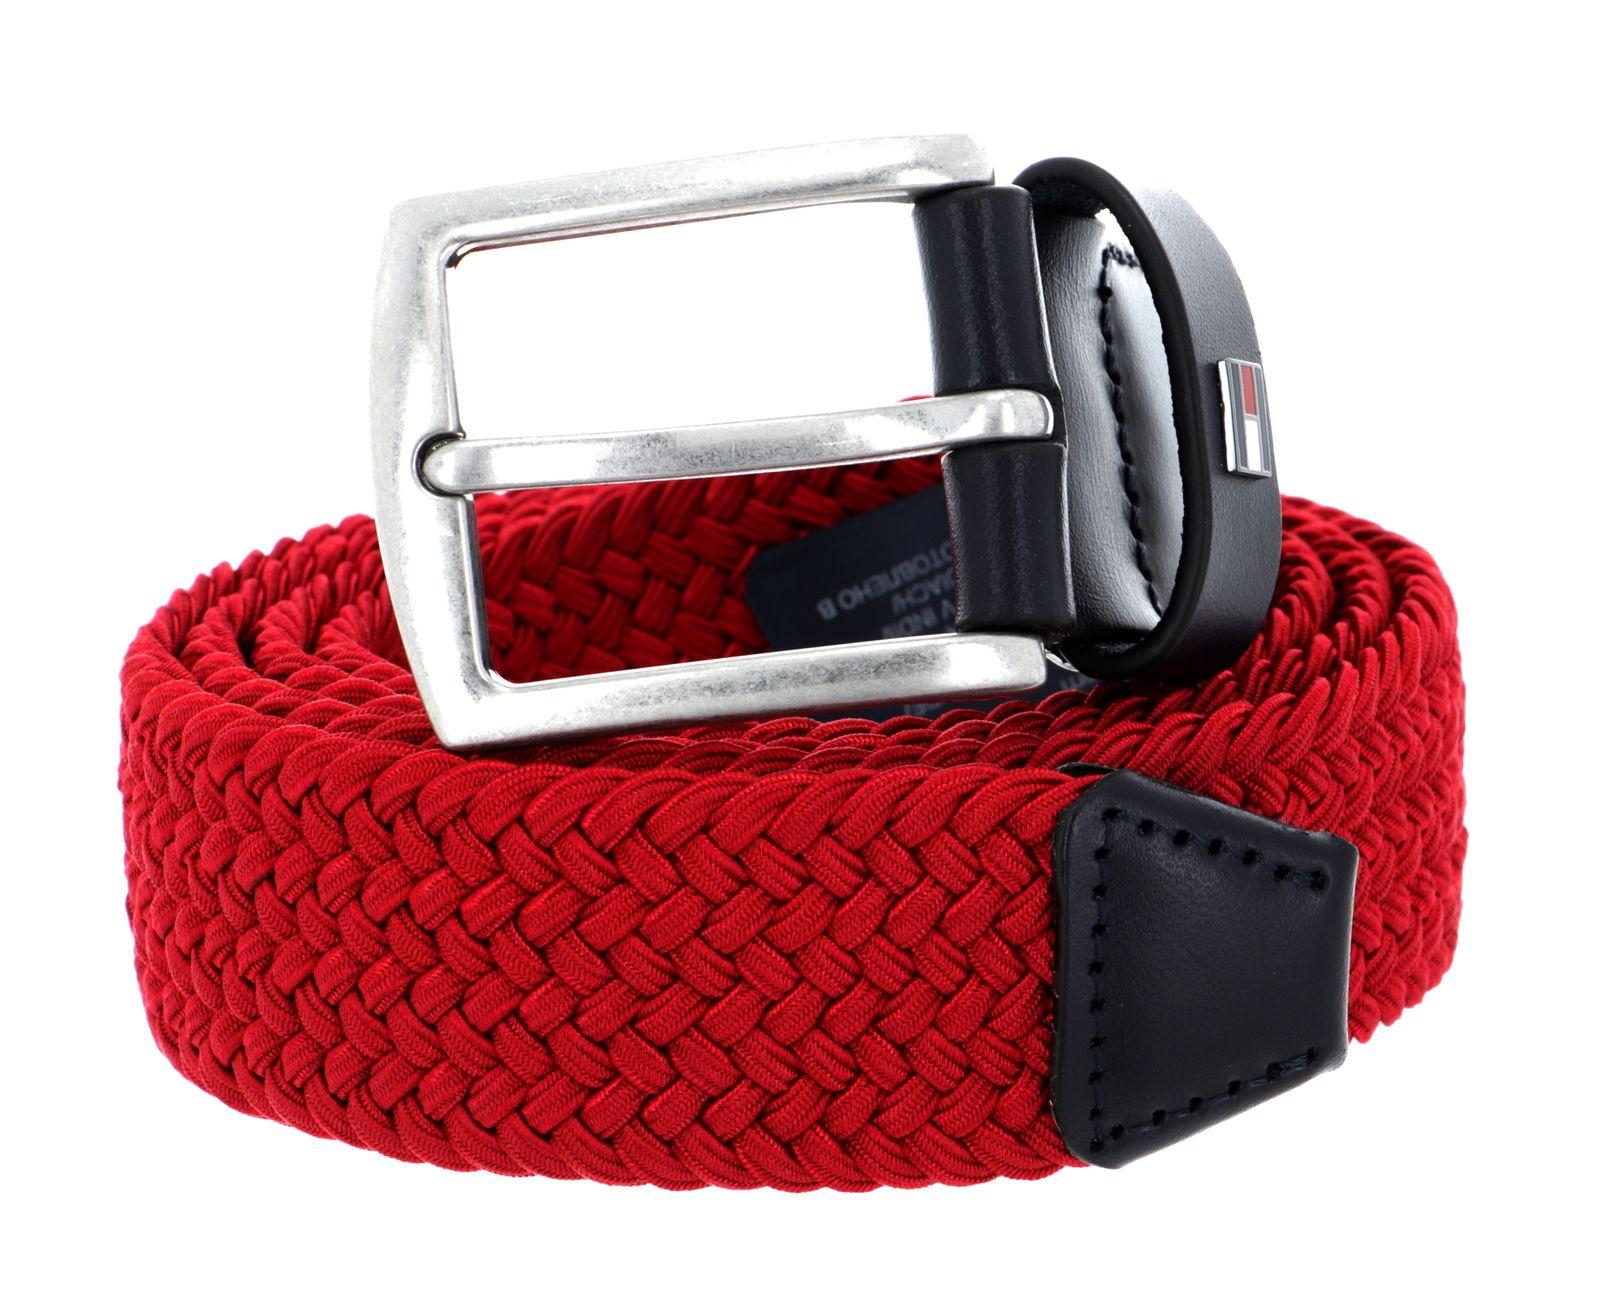 TOMMY HILFIGER Denton Elastic Belt 3.5 W100 Gürtel Accessoire Barbados Cherry